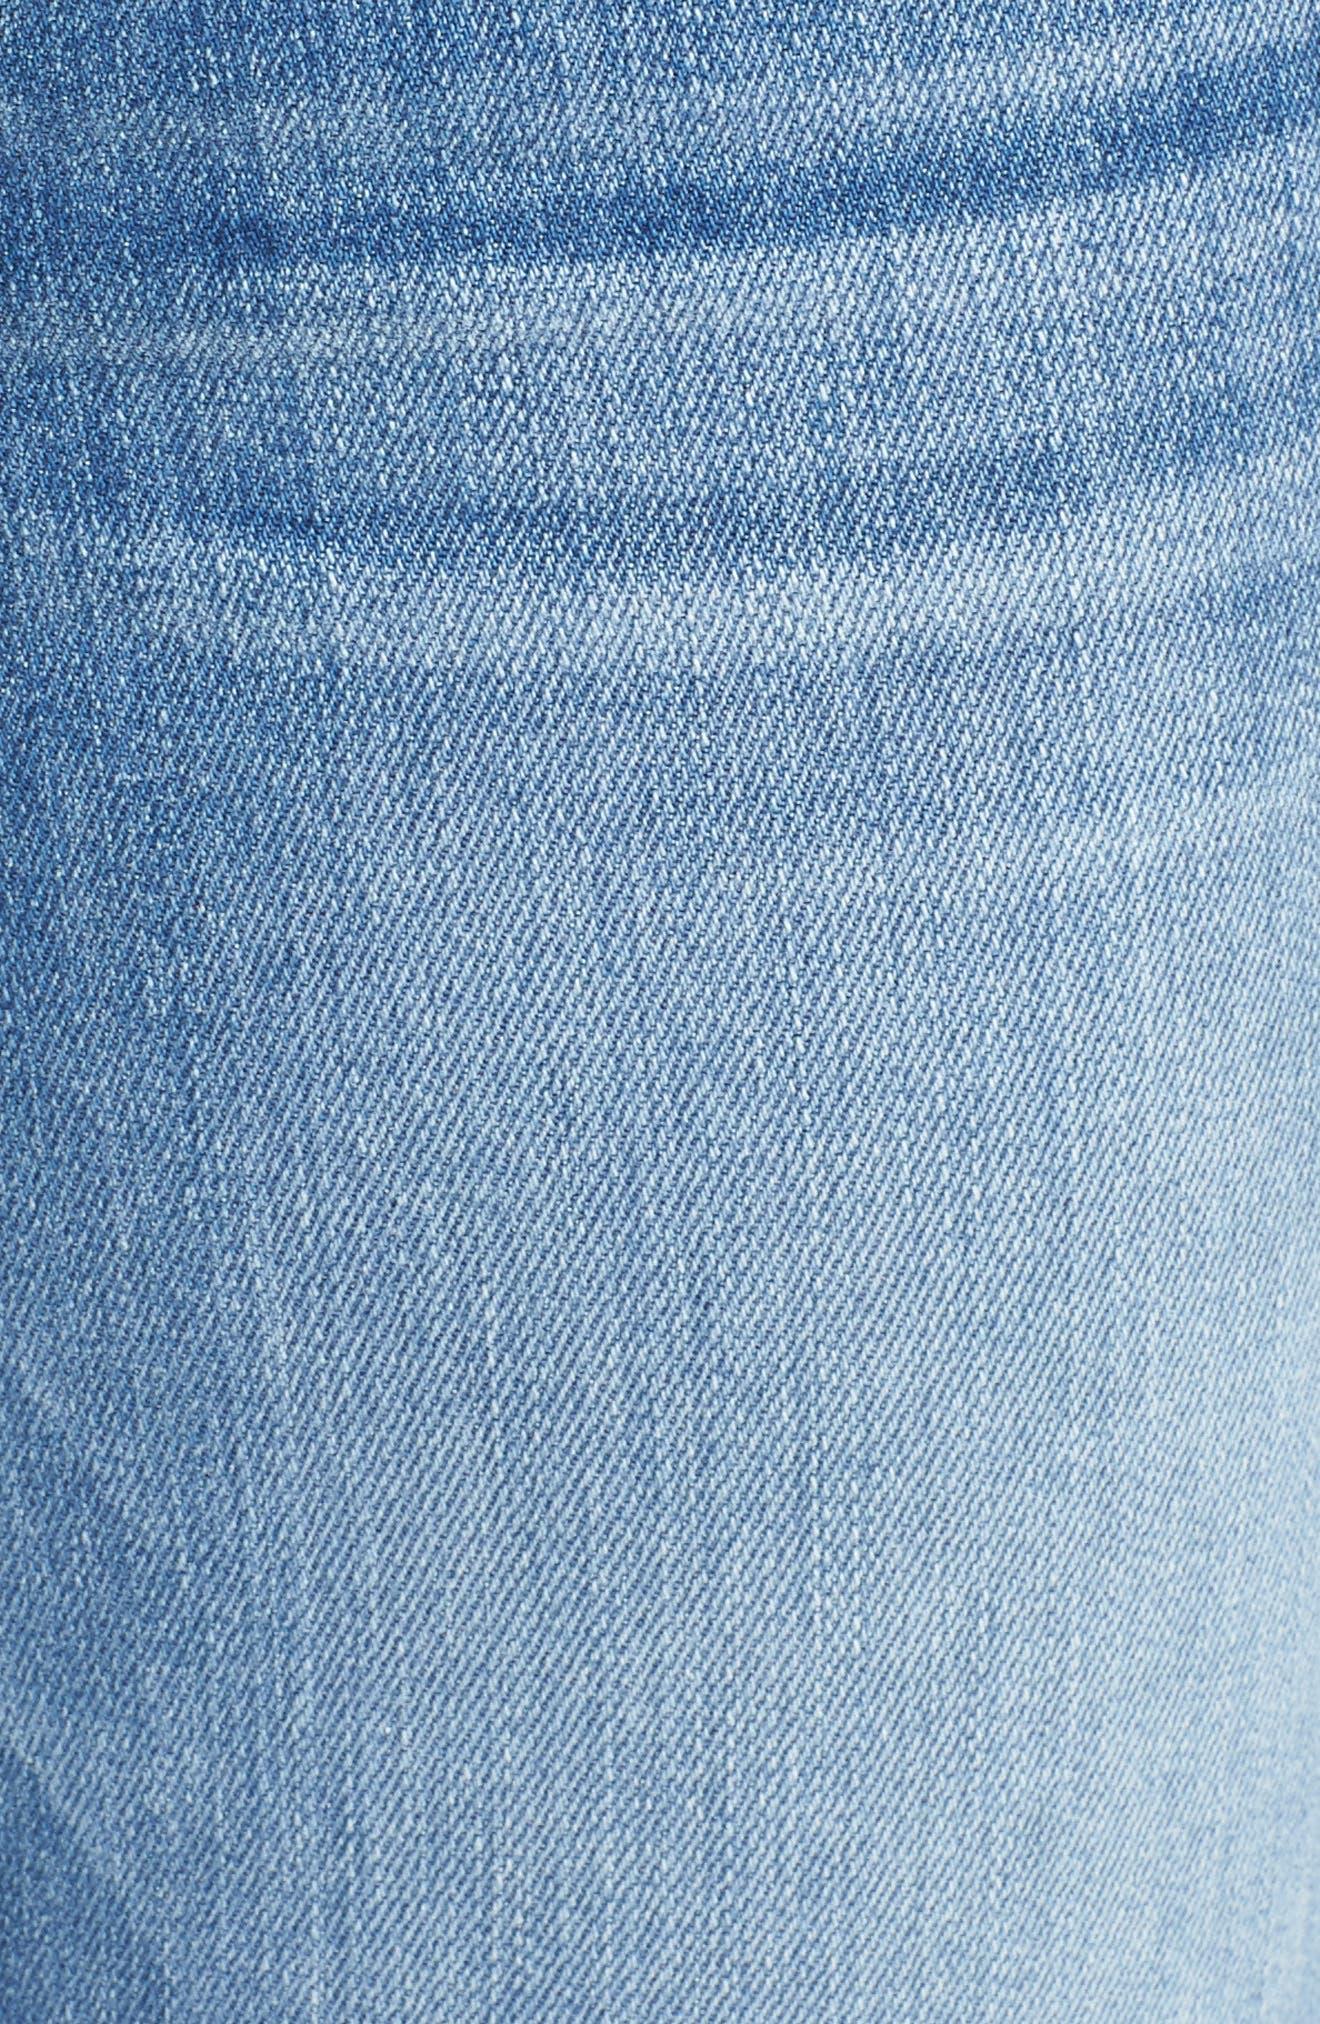 Transcend Vintage - Verdugo Ultra Skinny Jeans,                             Alternate thumbnail 5, color,                             400